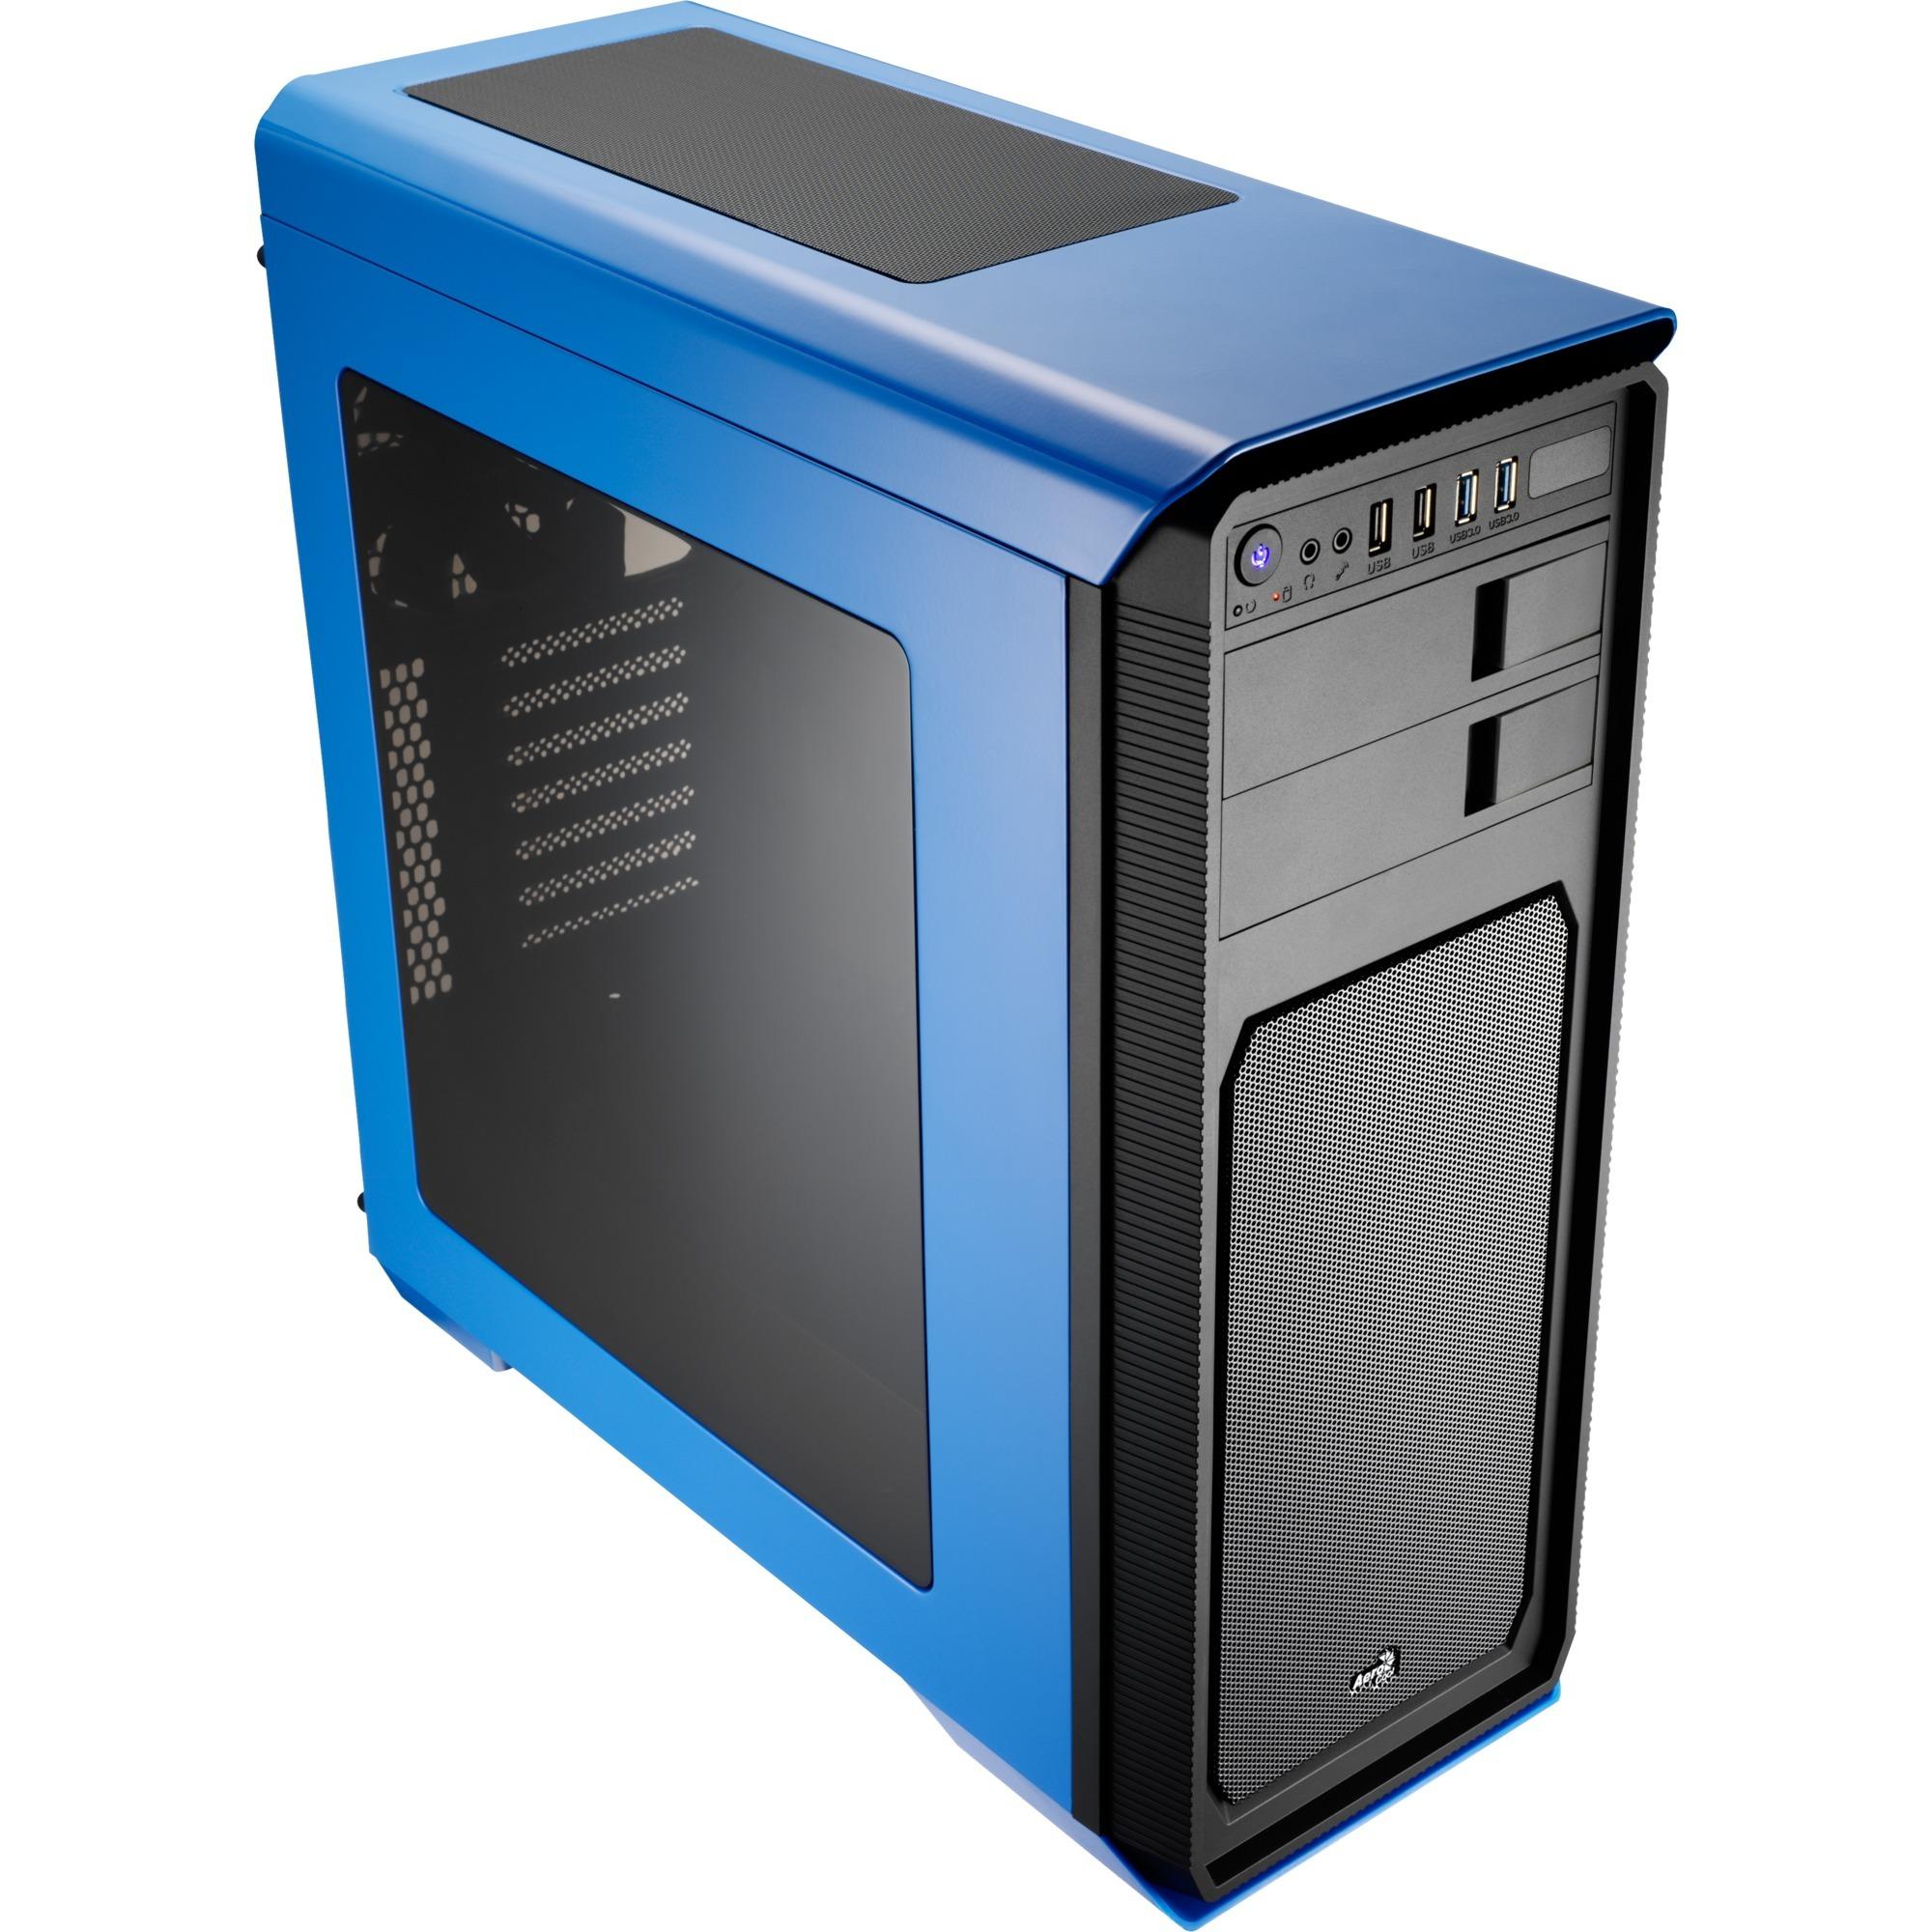 Aero-800 Midi-Tower Negro, Azul carcasa de ordenador, Cajas de torre